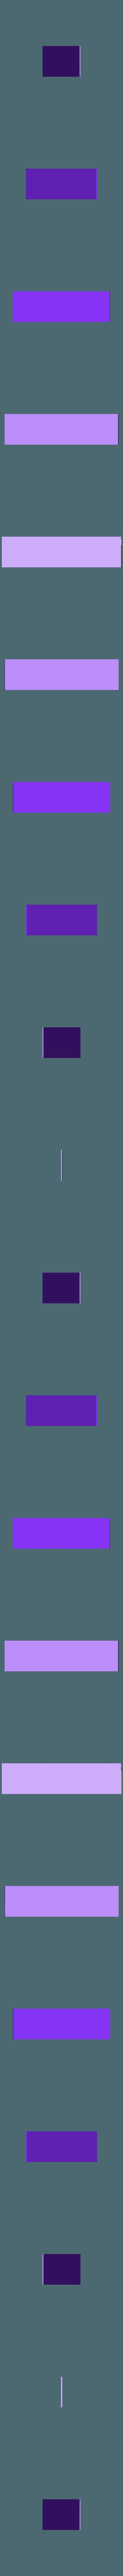 pol.STL Download free STL file # LIFEHACK3D-cajamuchiforma • Model to 3D print, izanferrco